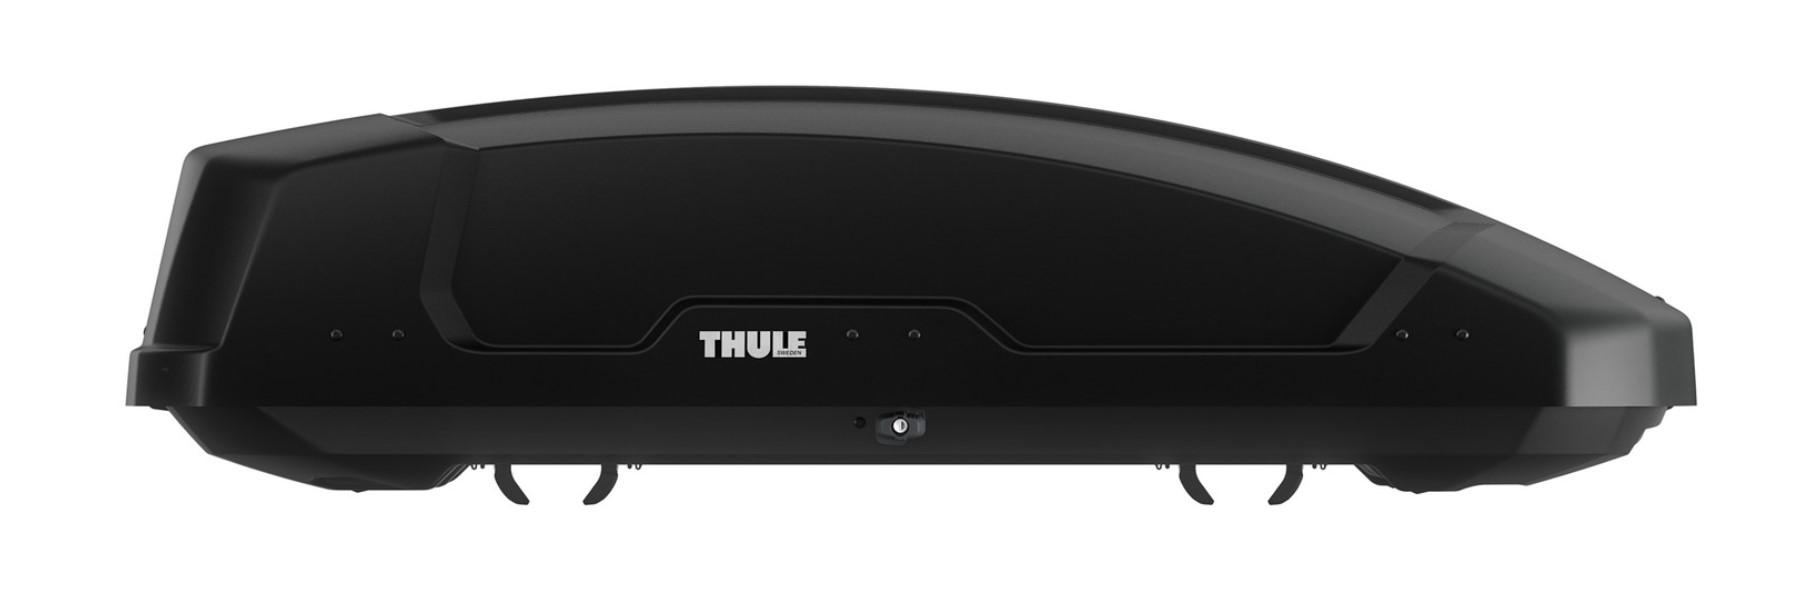 THULE Force XT box